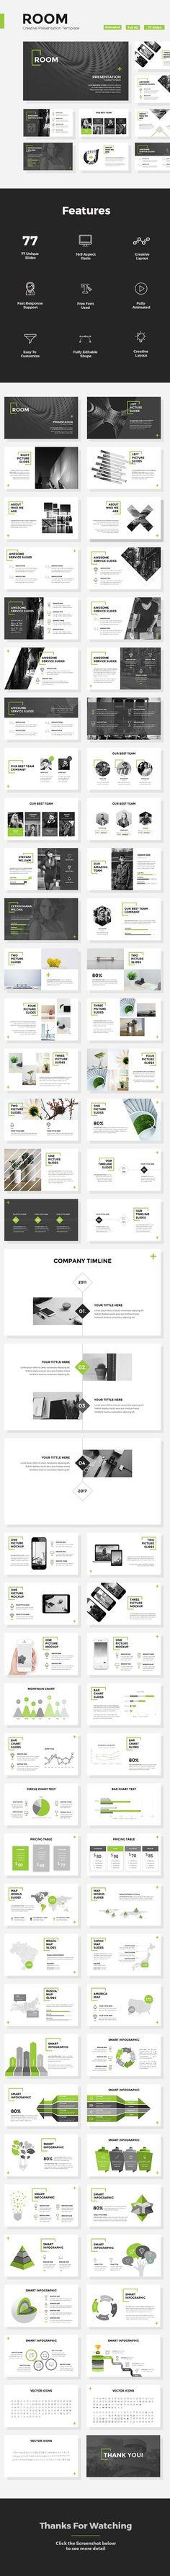 Room - Creative Powerpoint Template - Creative PowerPoint Templates